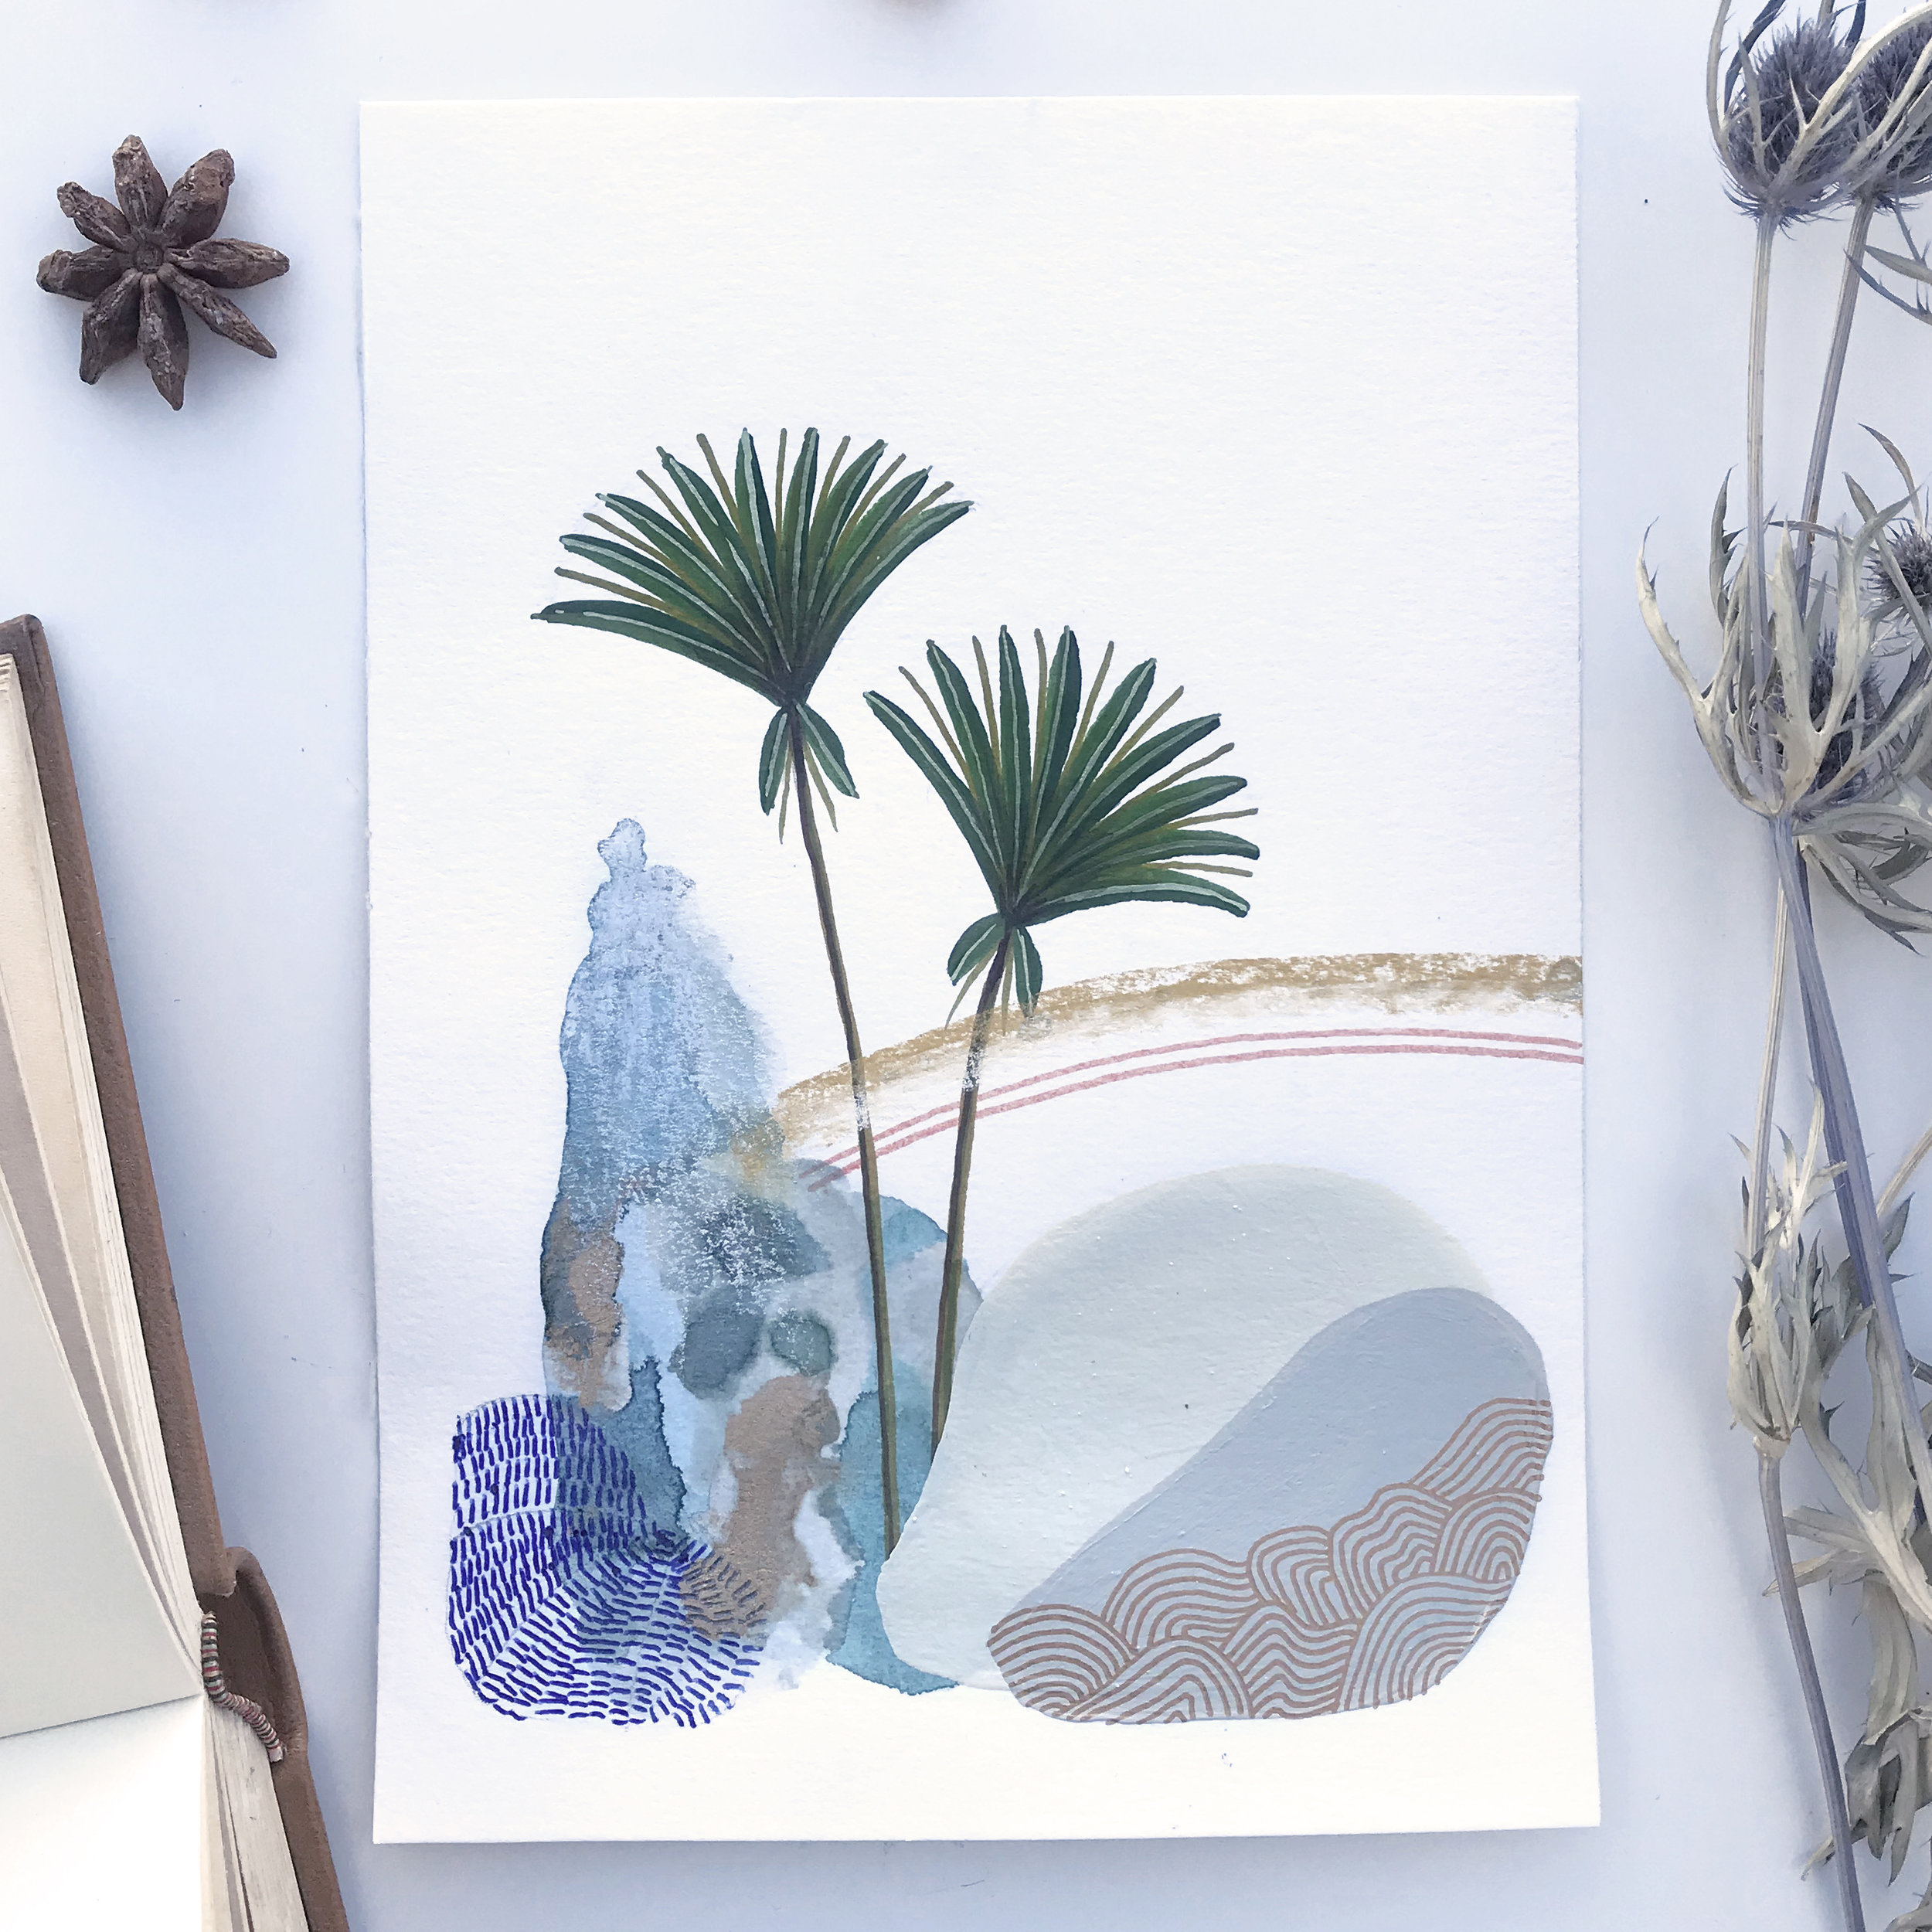 Althéïs Phedra  from Botanic garden, Herbarium - Mix media   2018